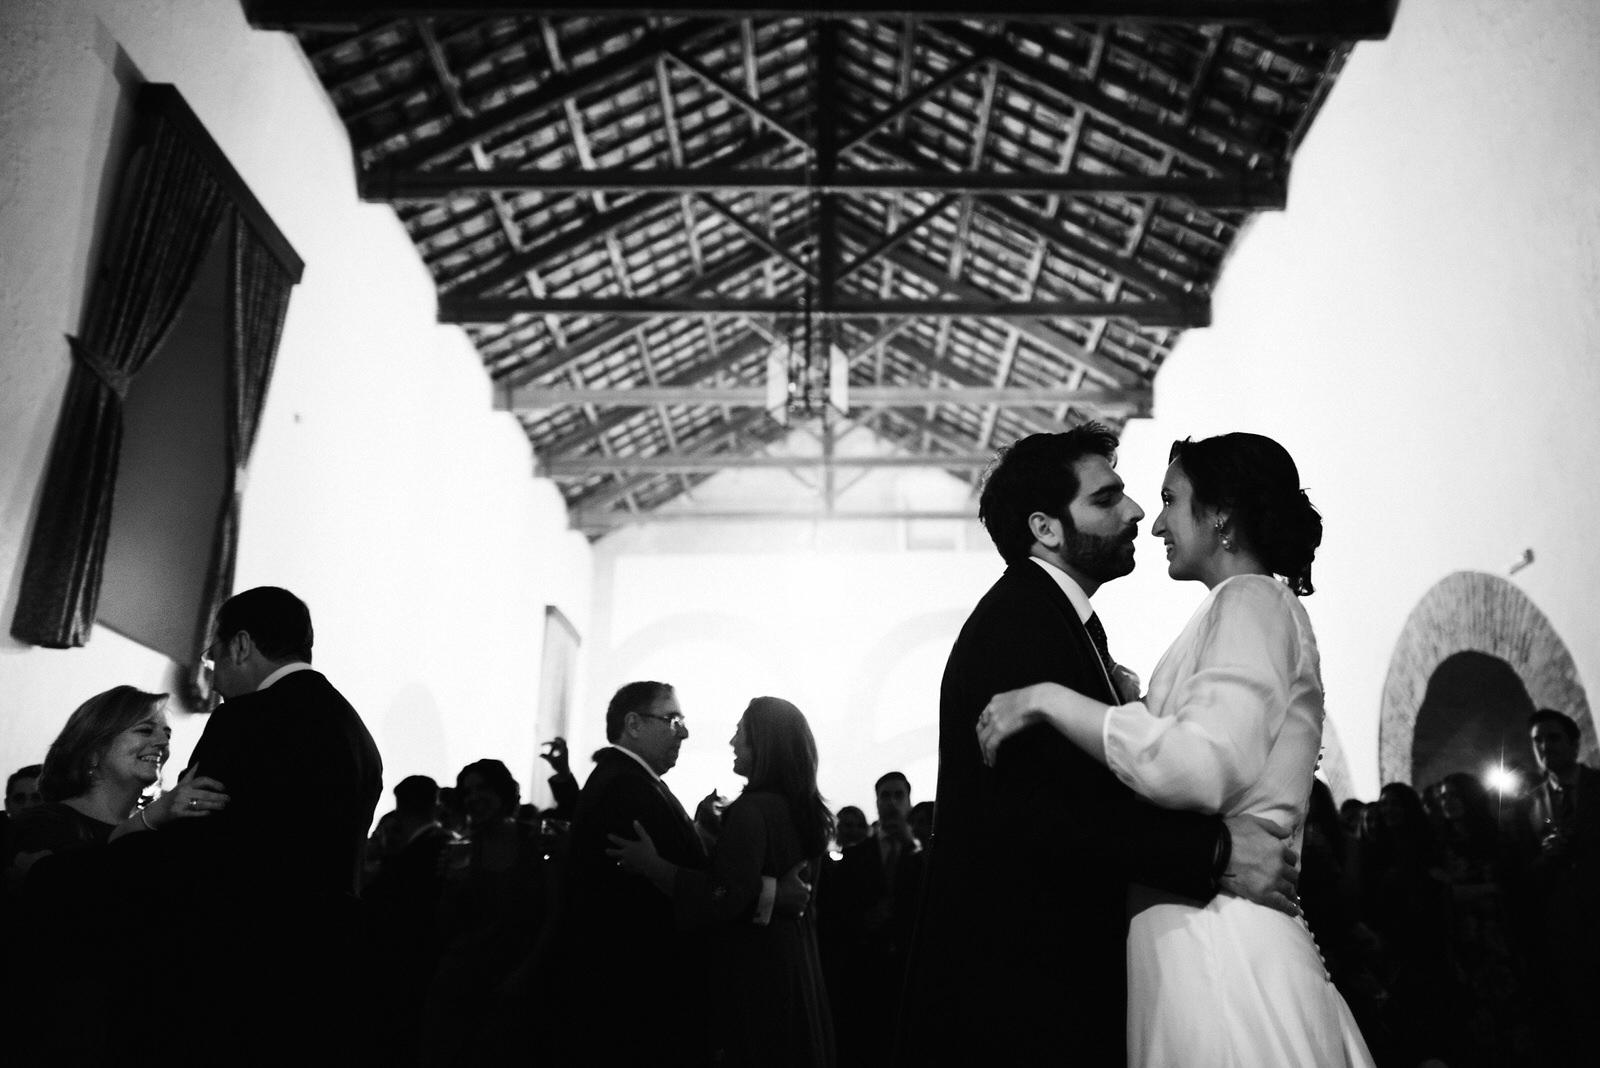 fotografo de bodas sevilla - fotografo boda - fotografía sevilla - Andrés AmarilloAAA_3737- fine.JPG